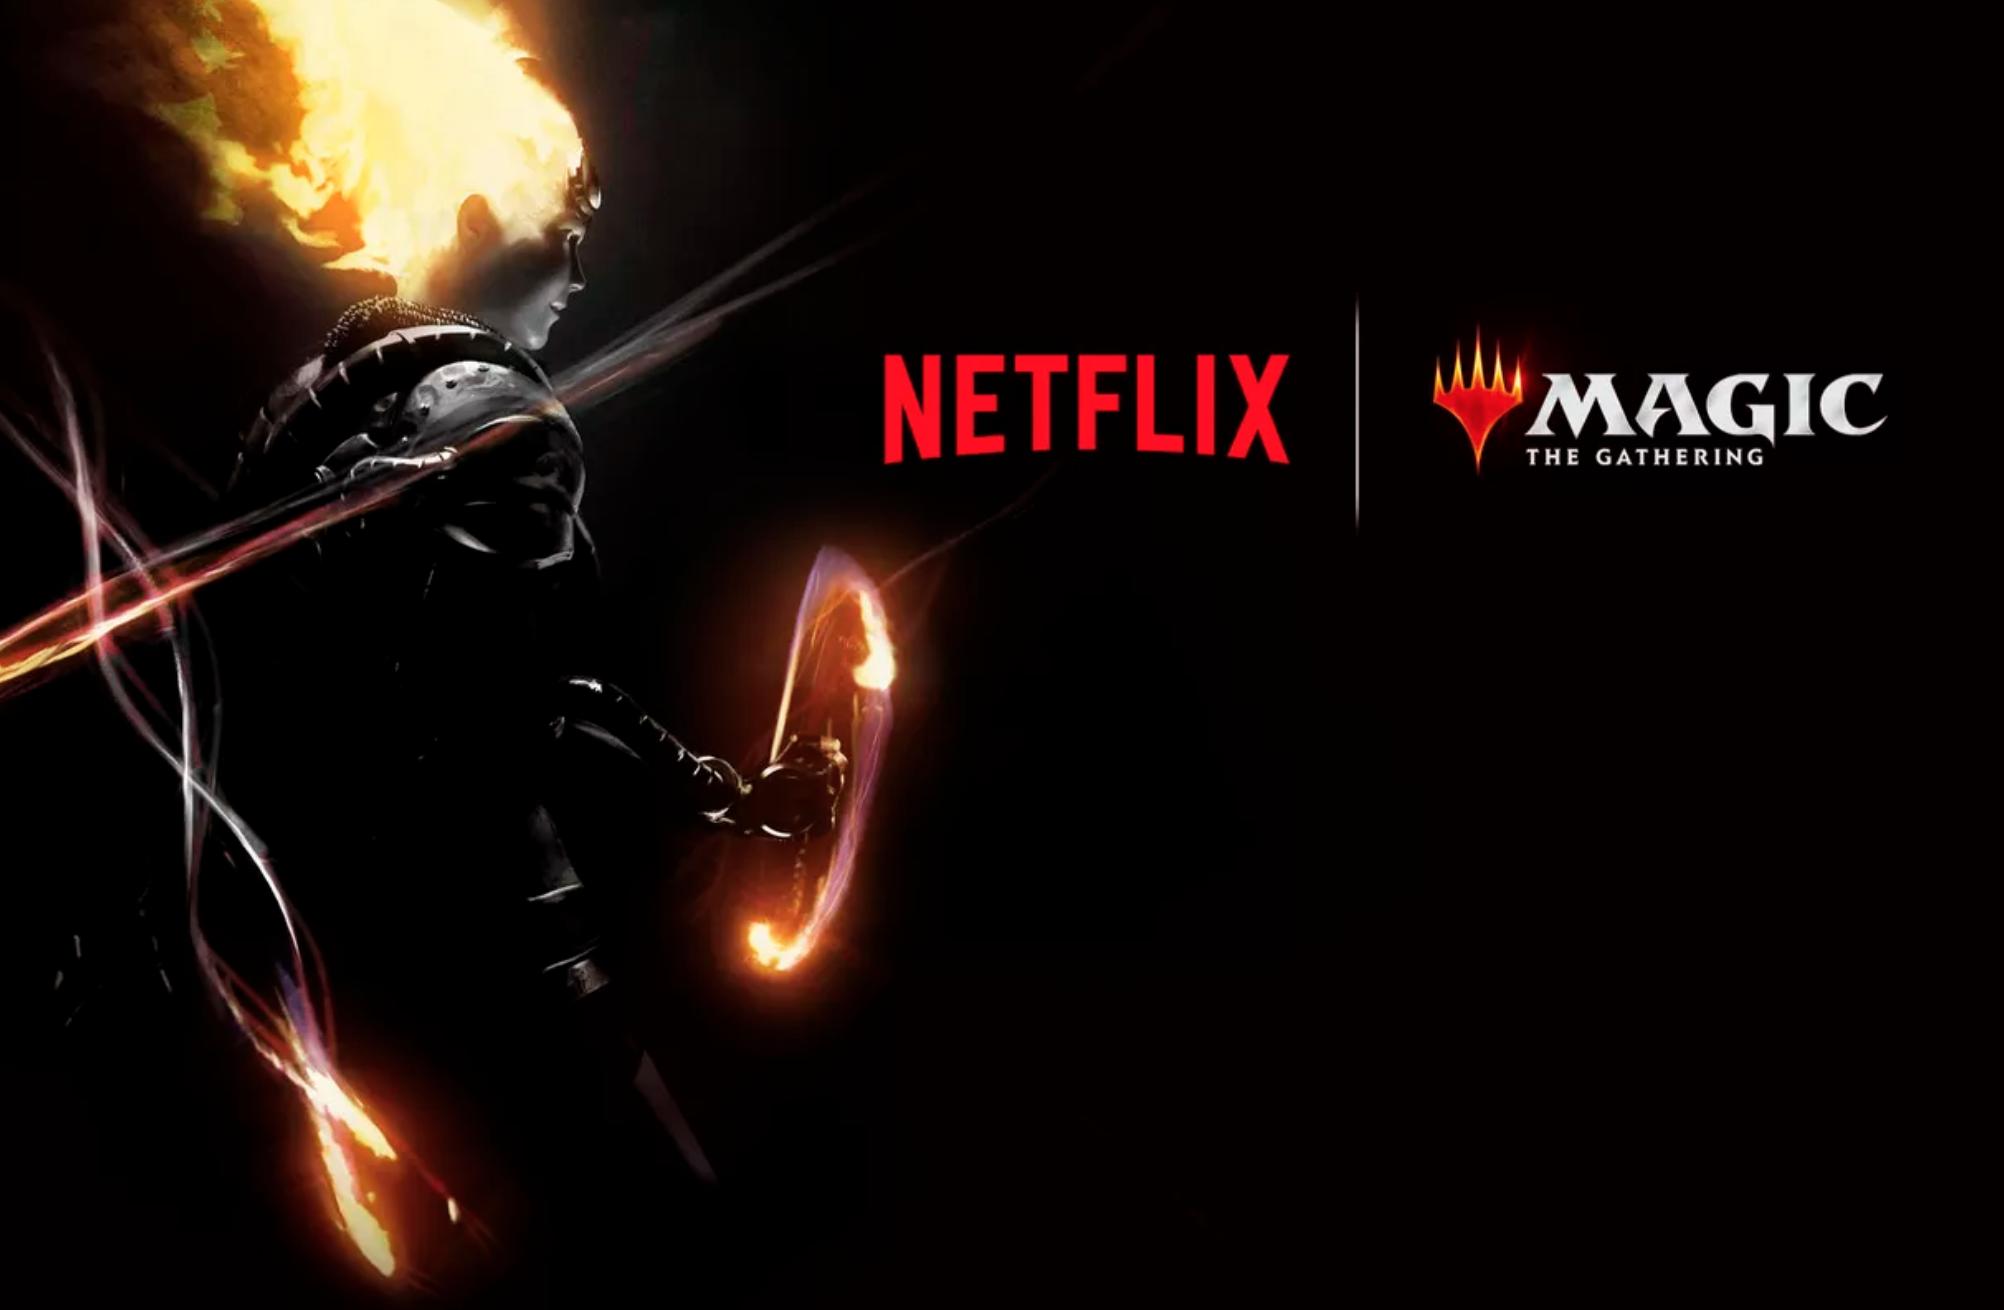 Netflix Magic the Gathering